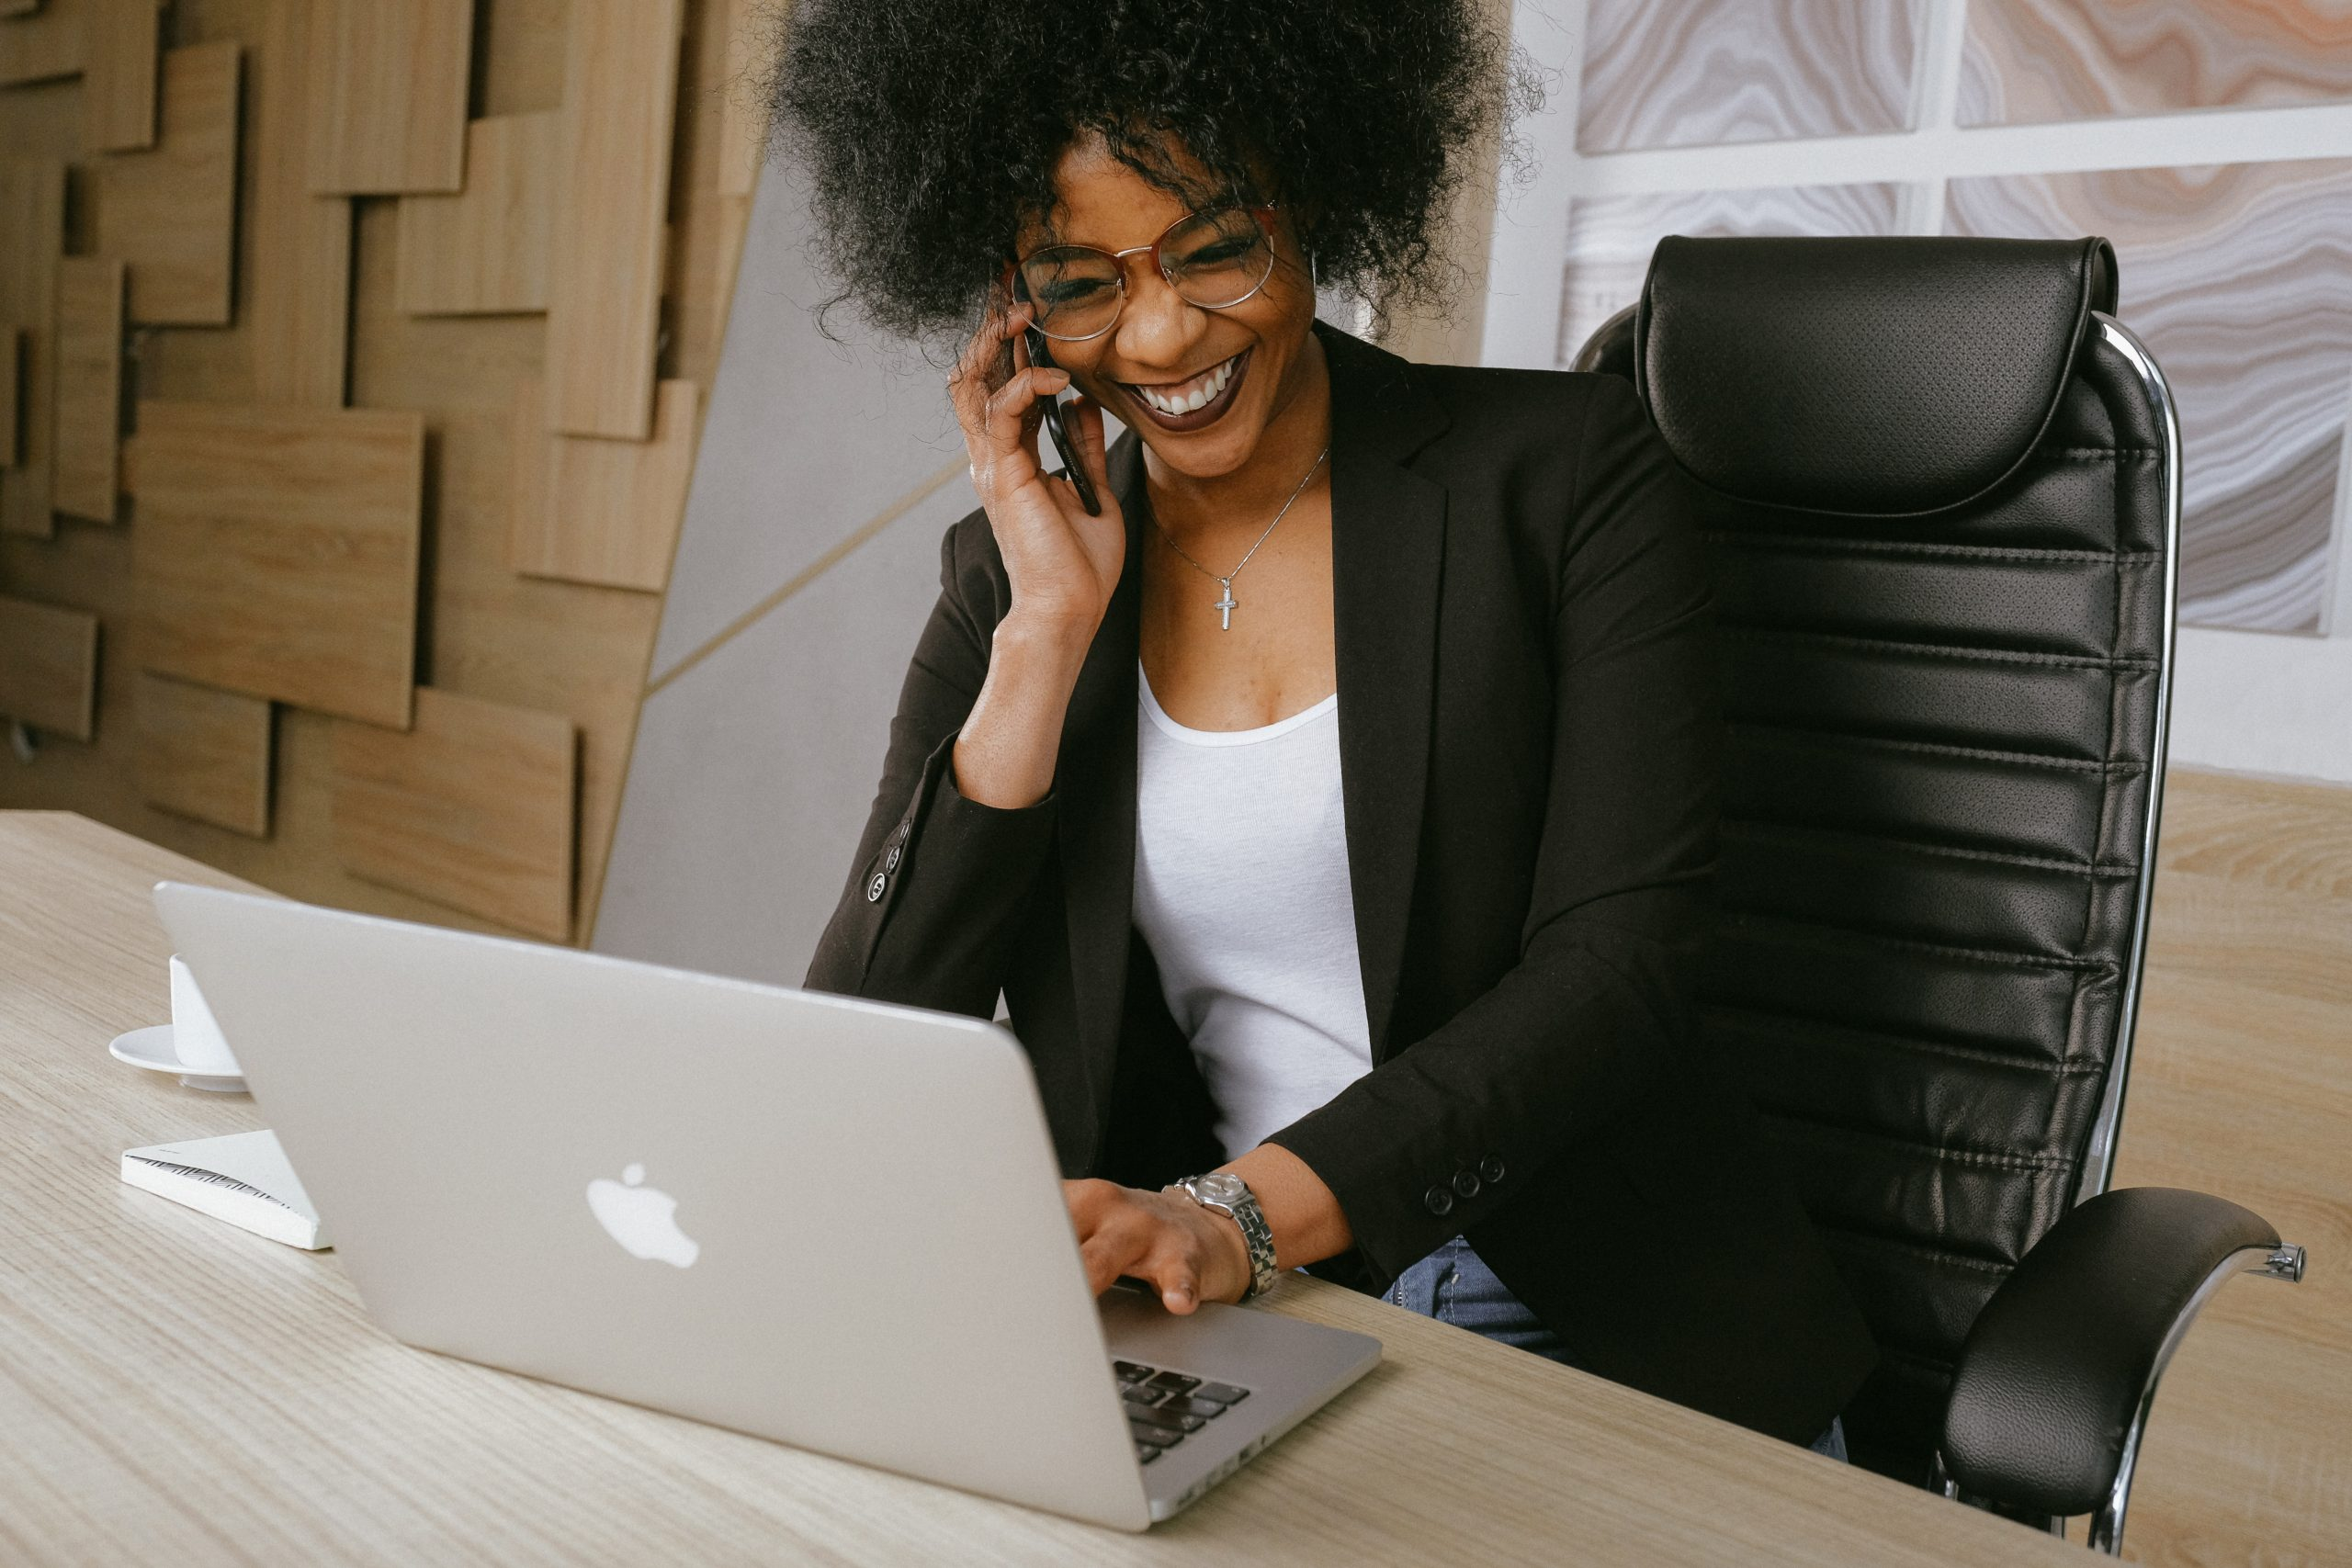 woman-in-black-blazer-sitting-on-black-office-chair-3727464